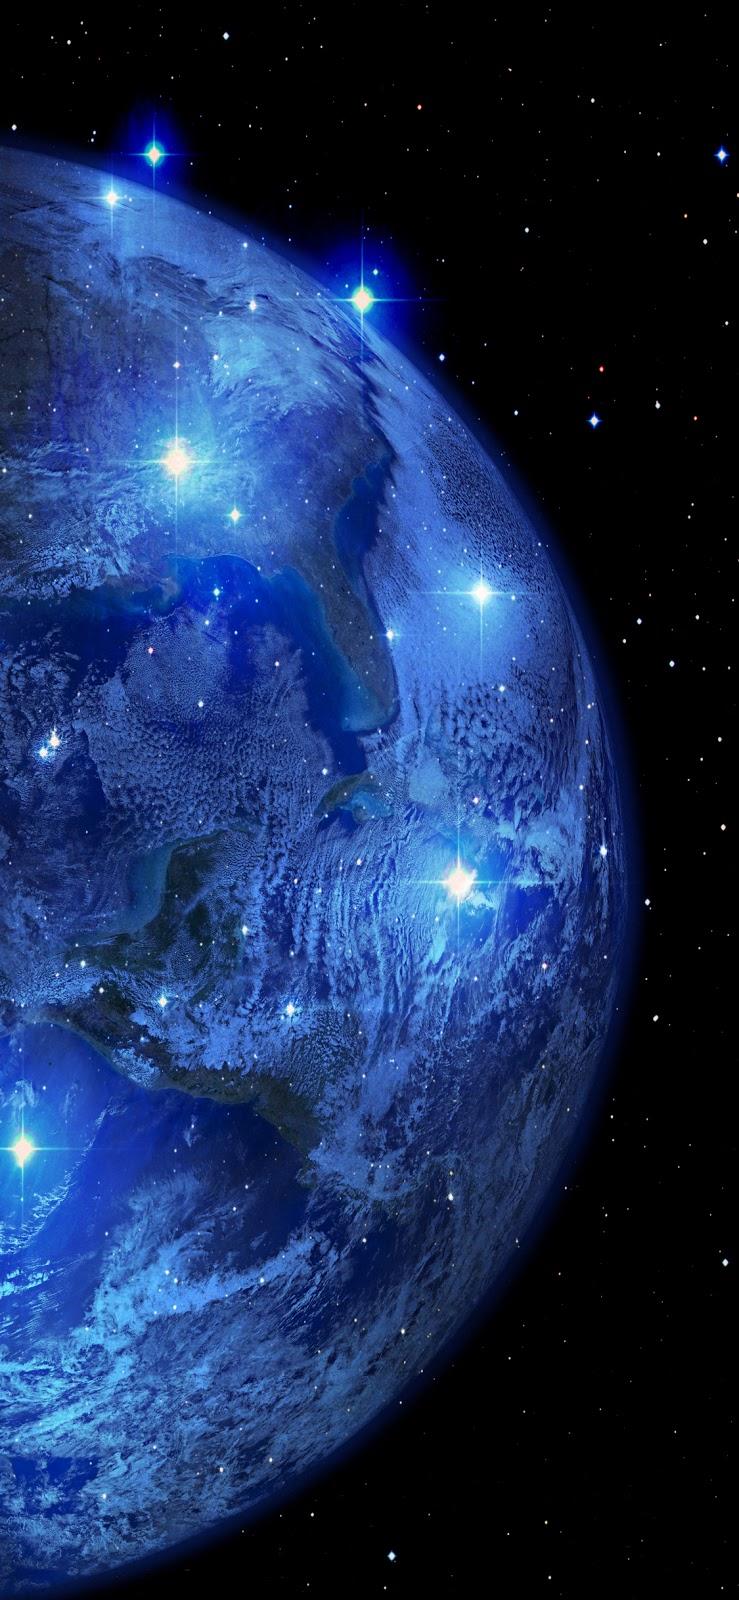 Blue Earth (iPhone X)